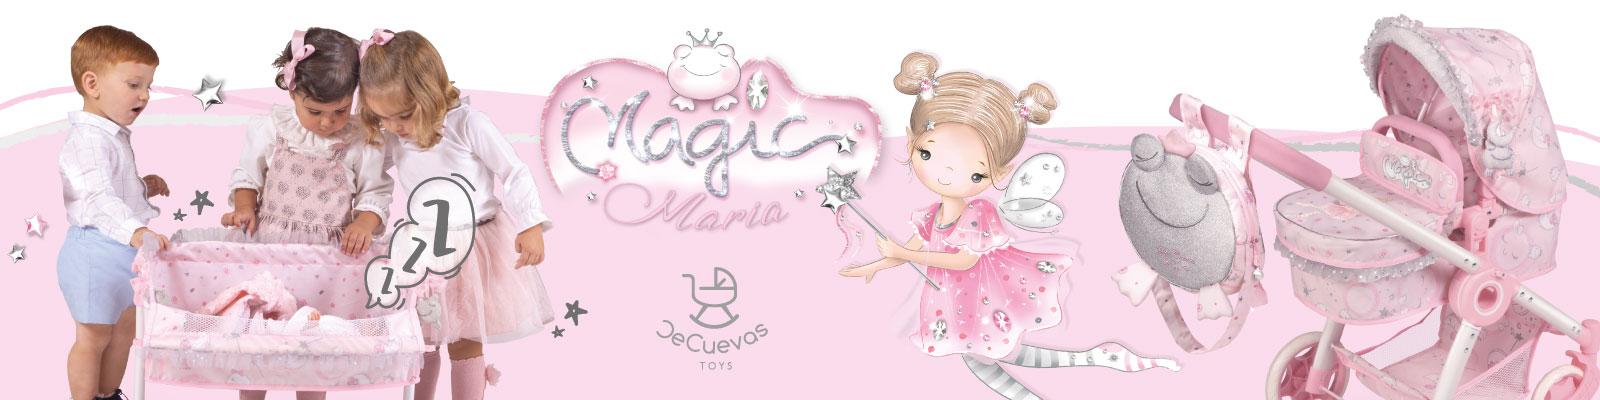 Magic Maria